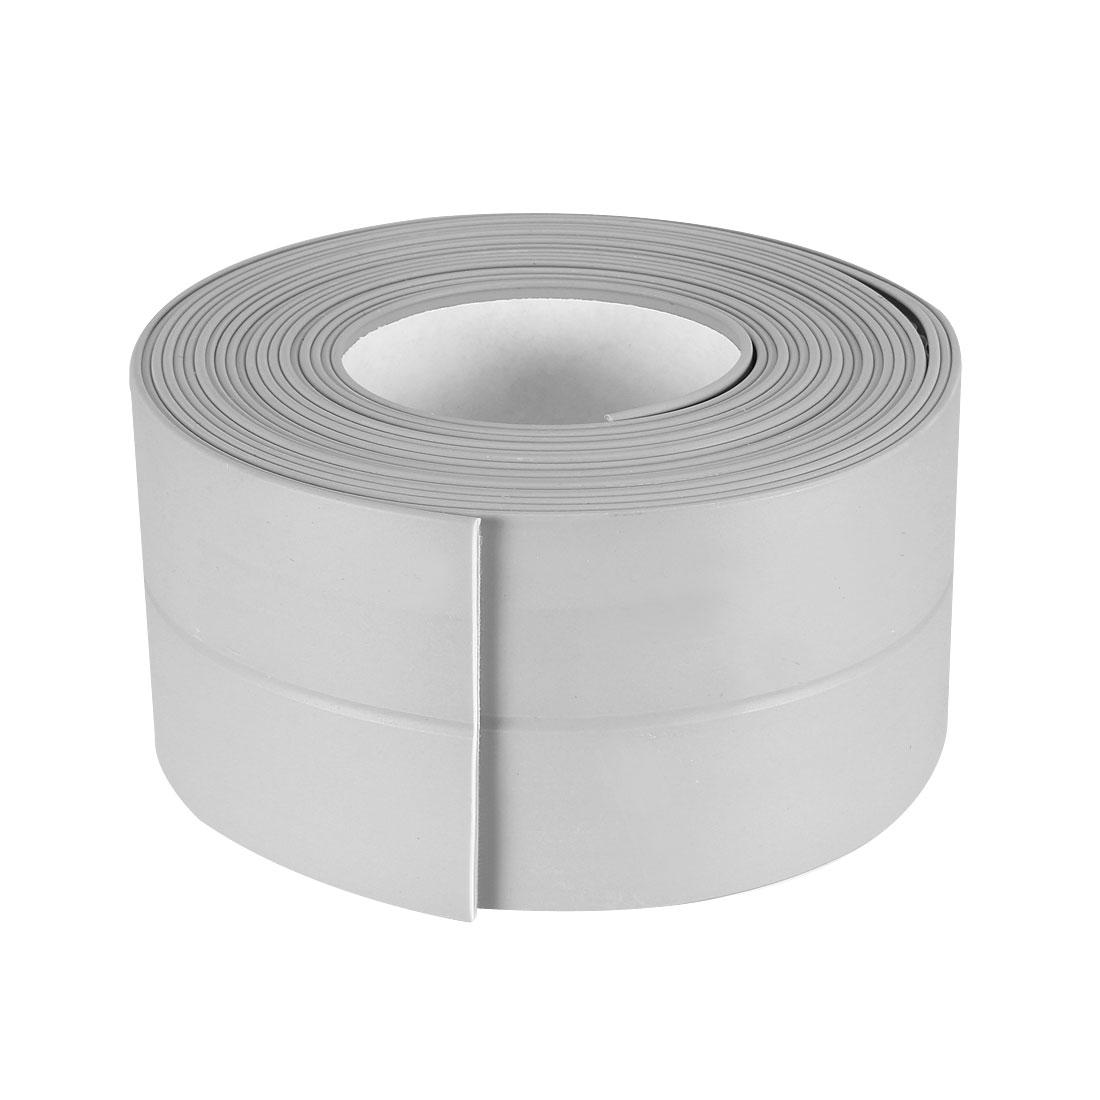 Caulk Strip Flexible Self Adhesive Tape for Wall Sealing 10.5ftx38mm Gray, 3 Pcs